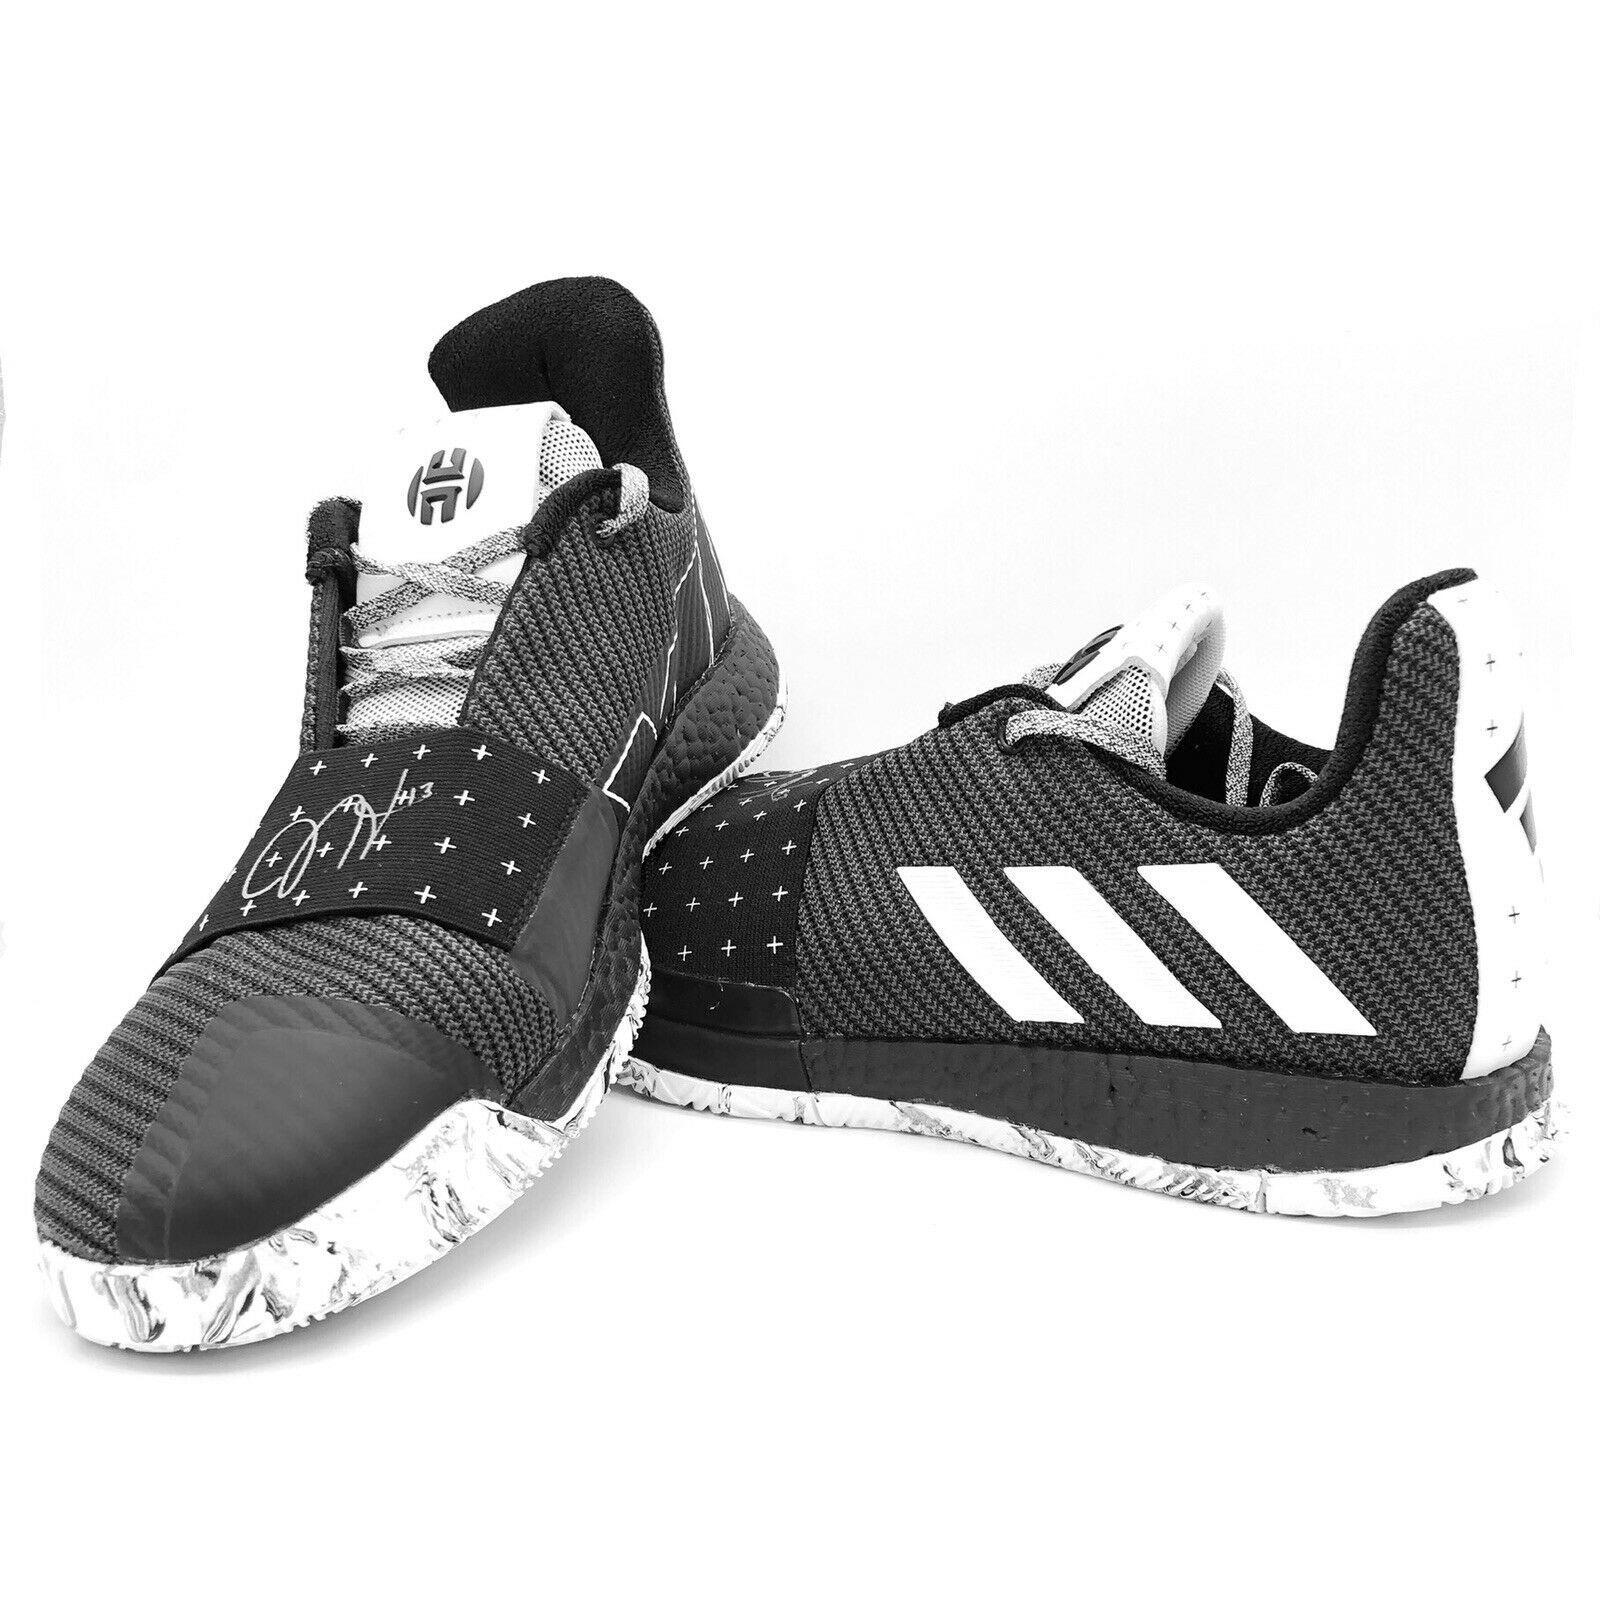 Adidas Harden Vol 3 Black White